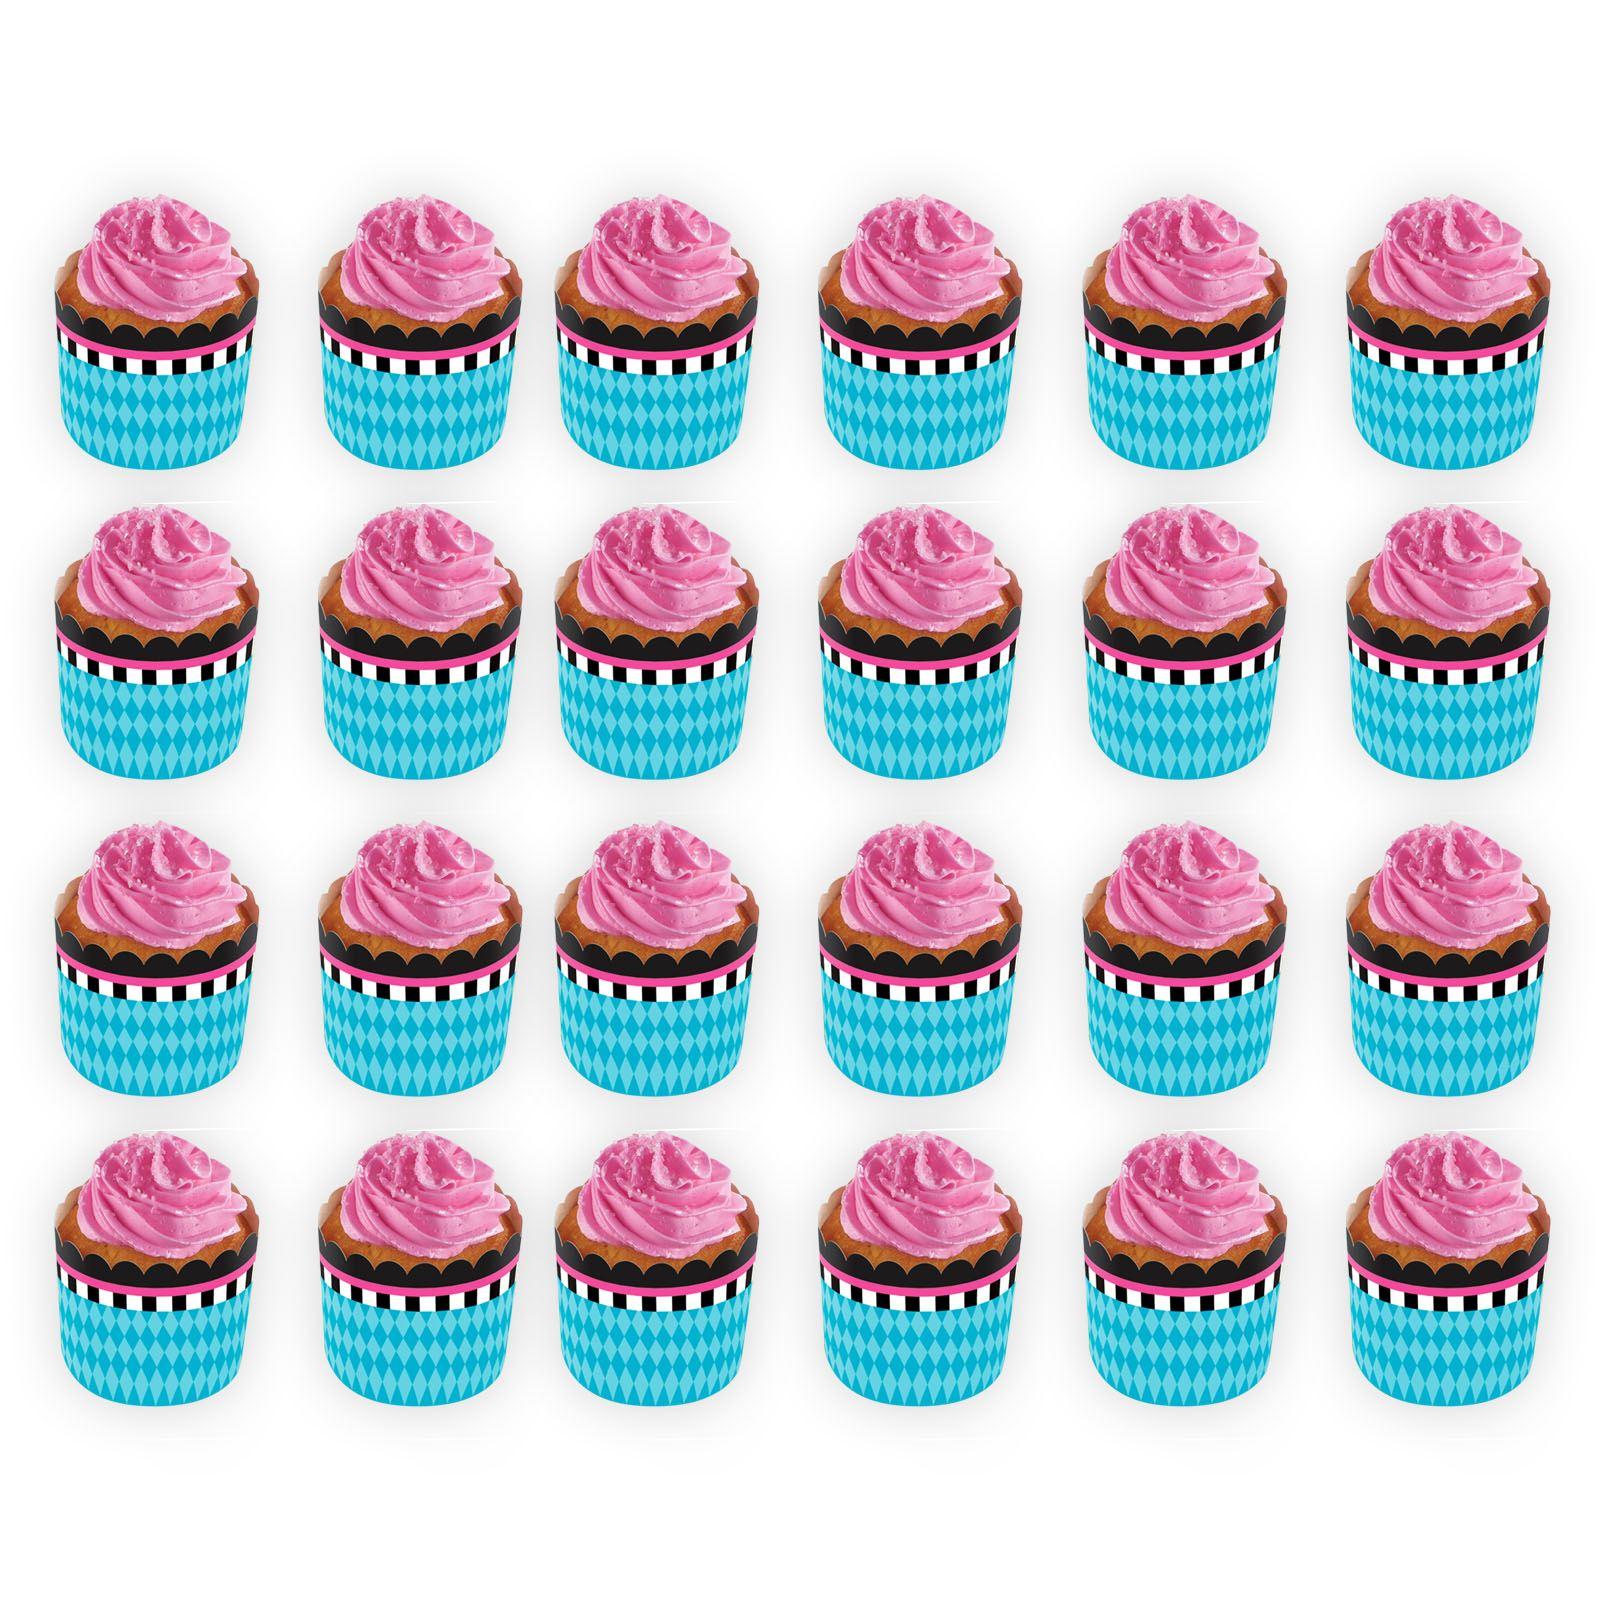 24 Blue Pink Baby Shower Cupcake Cake Cases Bowl Holder Birthday Tea